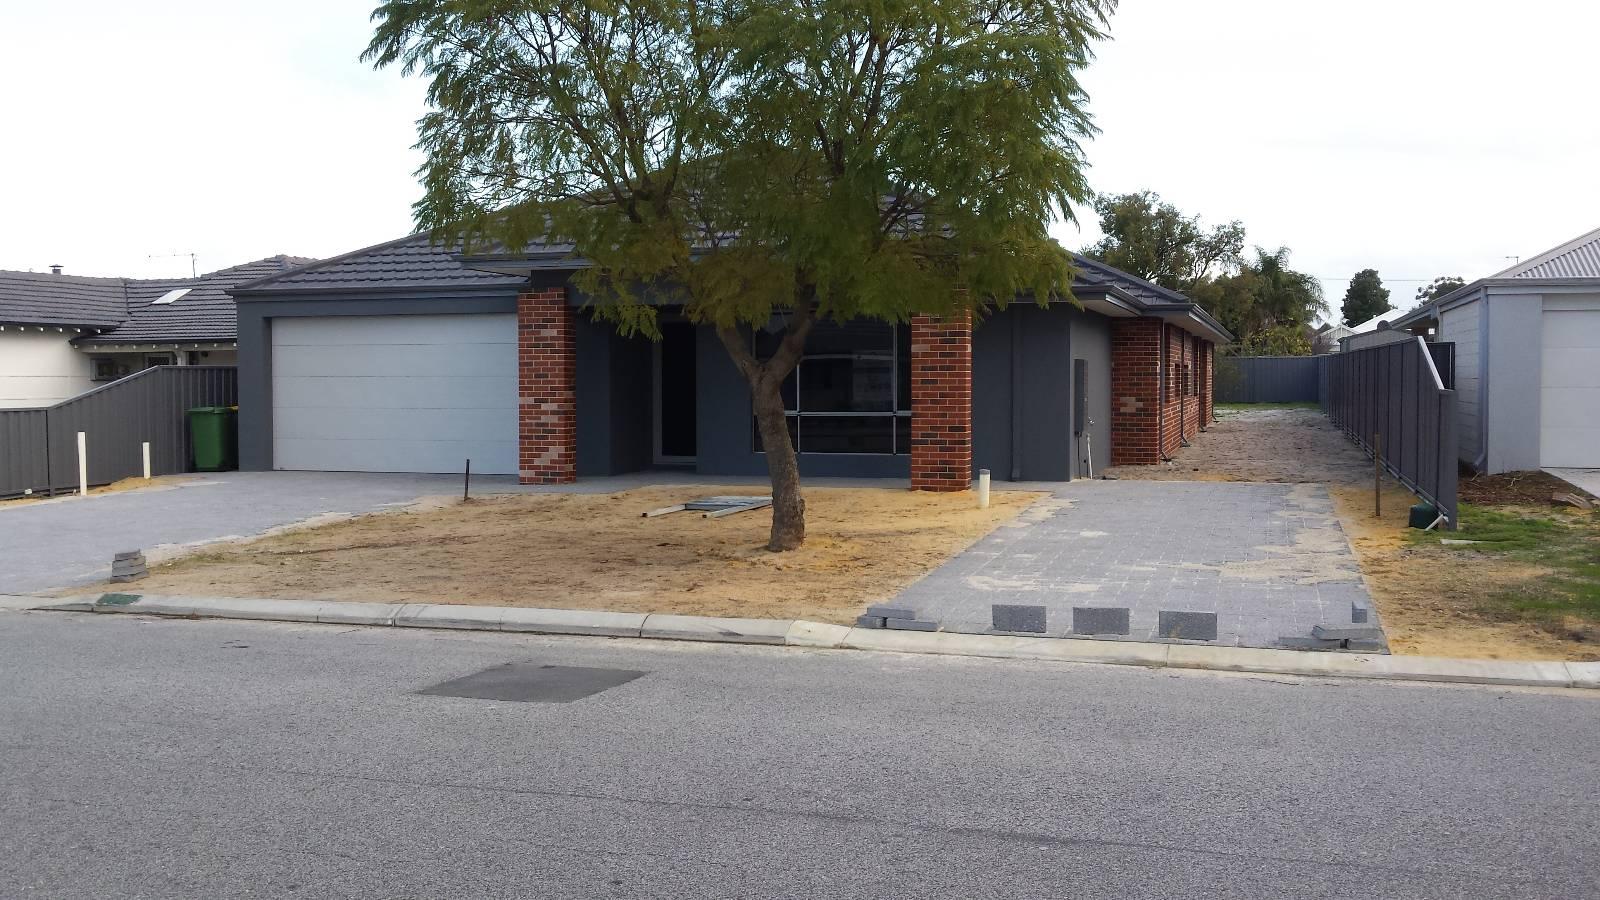 Individual Design - New Choice Homes